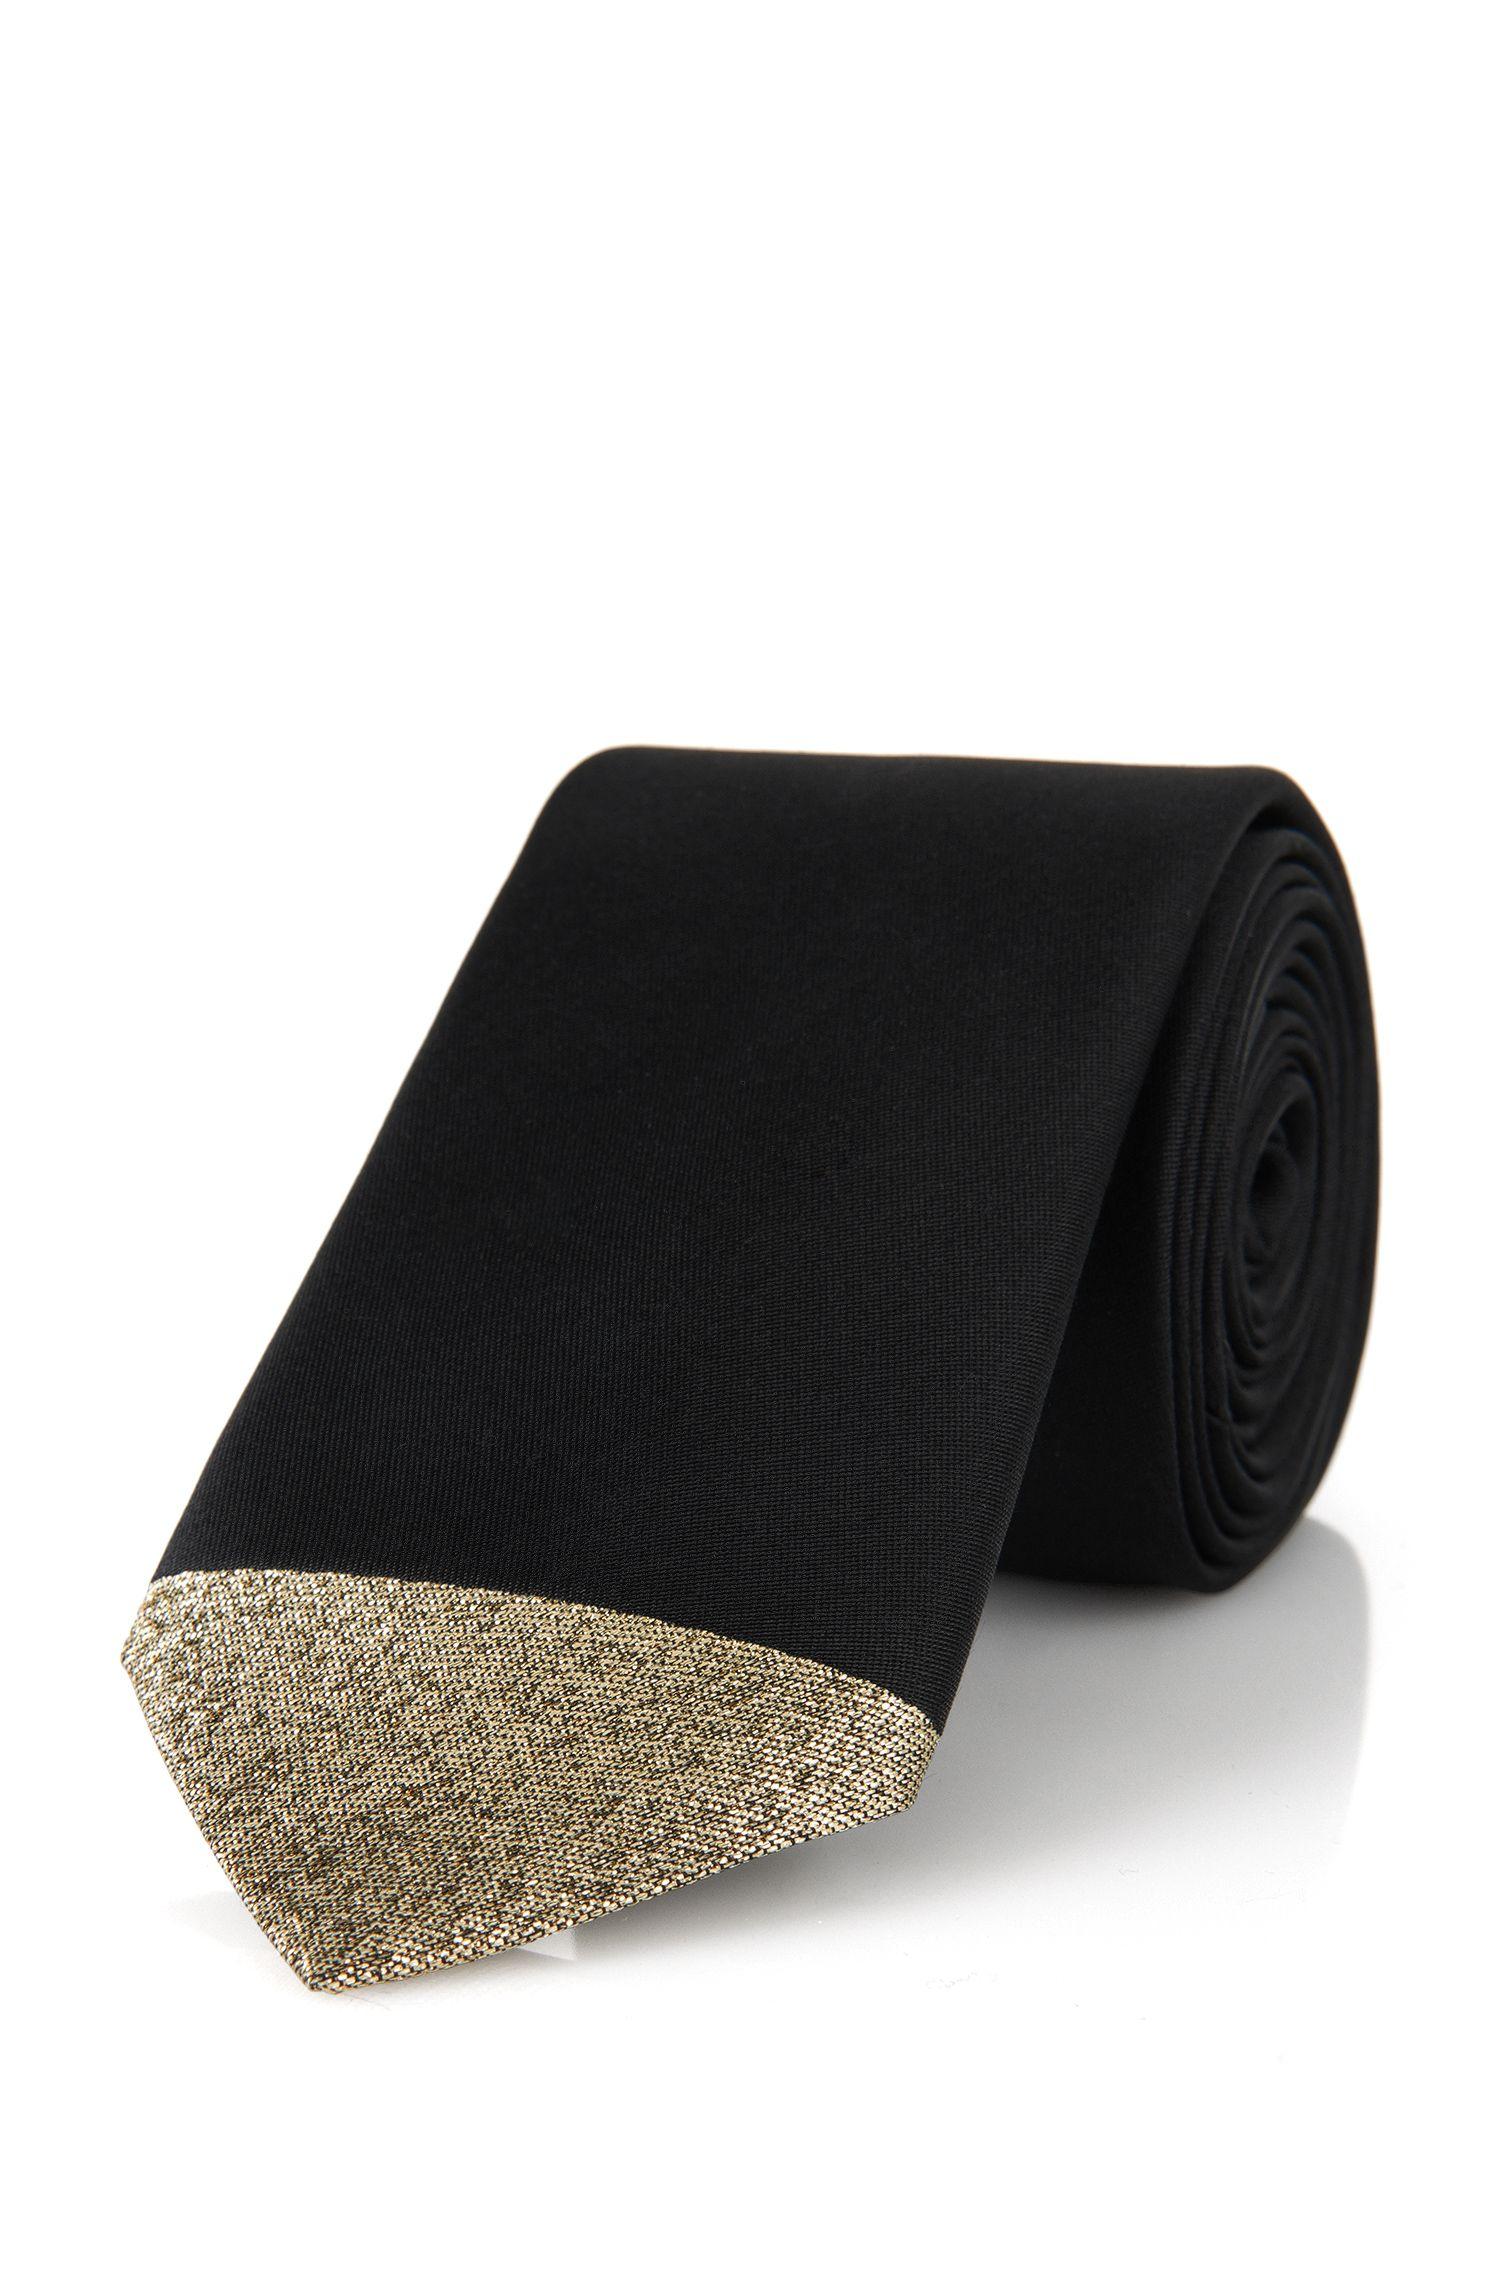 'Tie 6 cm' | Slim, Silk Blend Metallic Tie